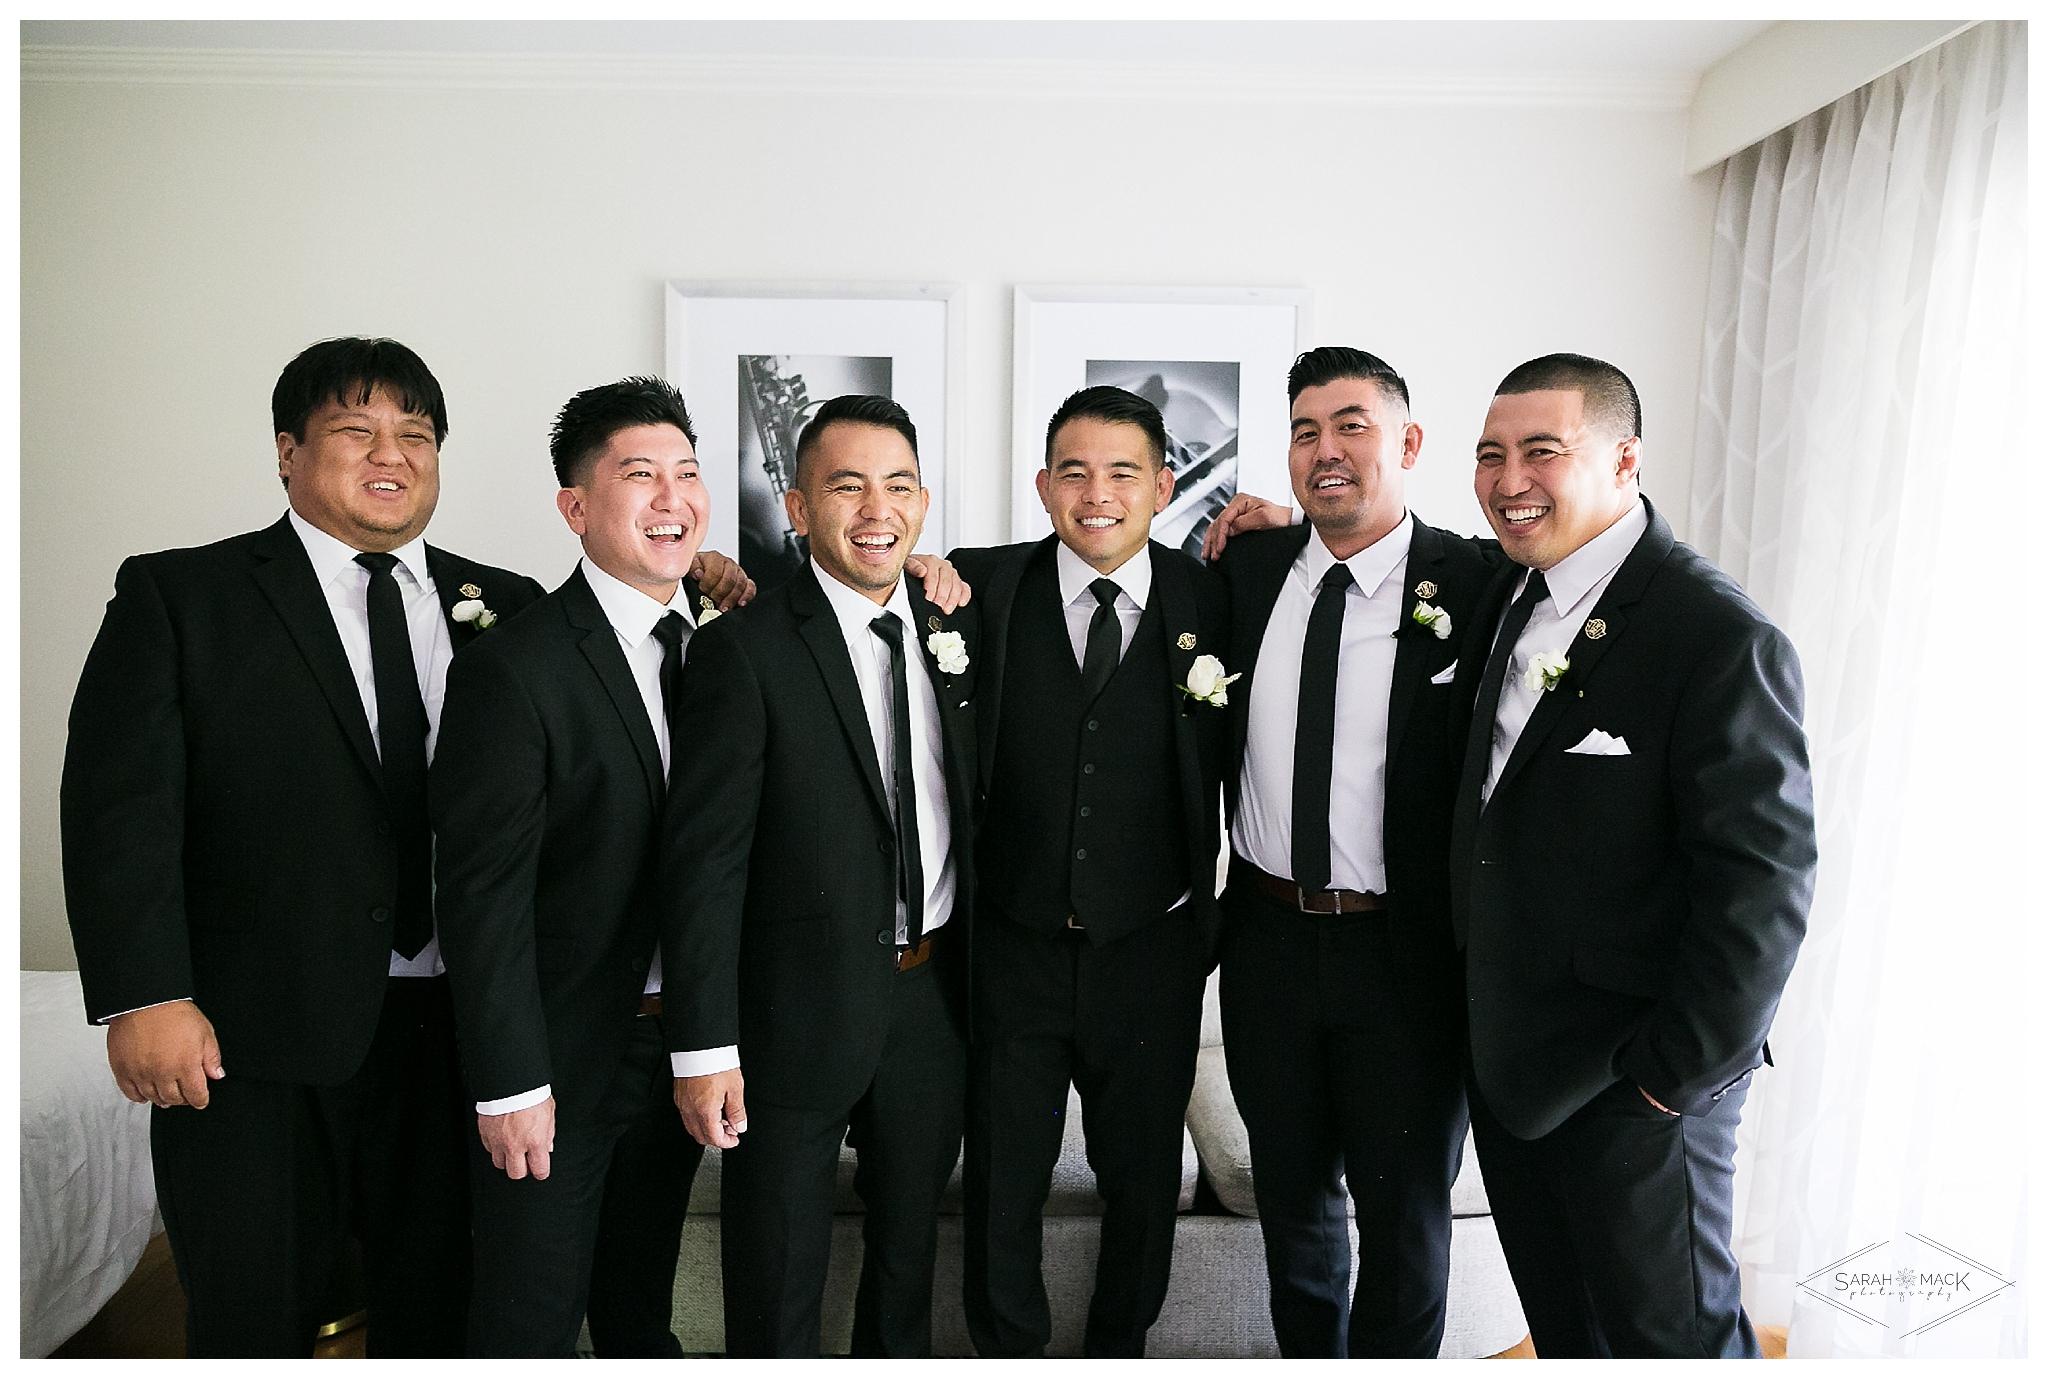 LE-Avenue-of-the-Arts-Costa-Mesa-Wedding-Photography-0050.jpg